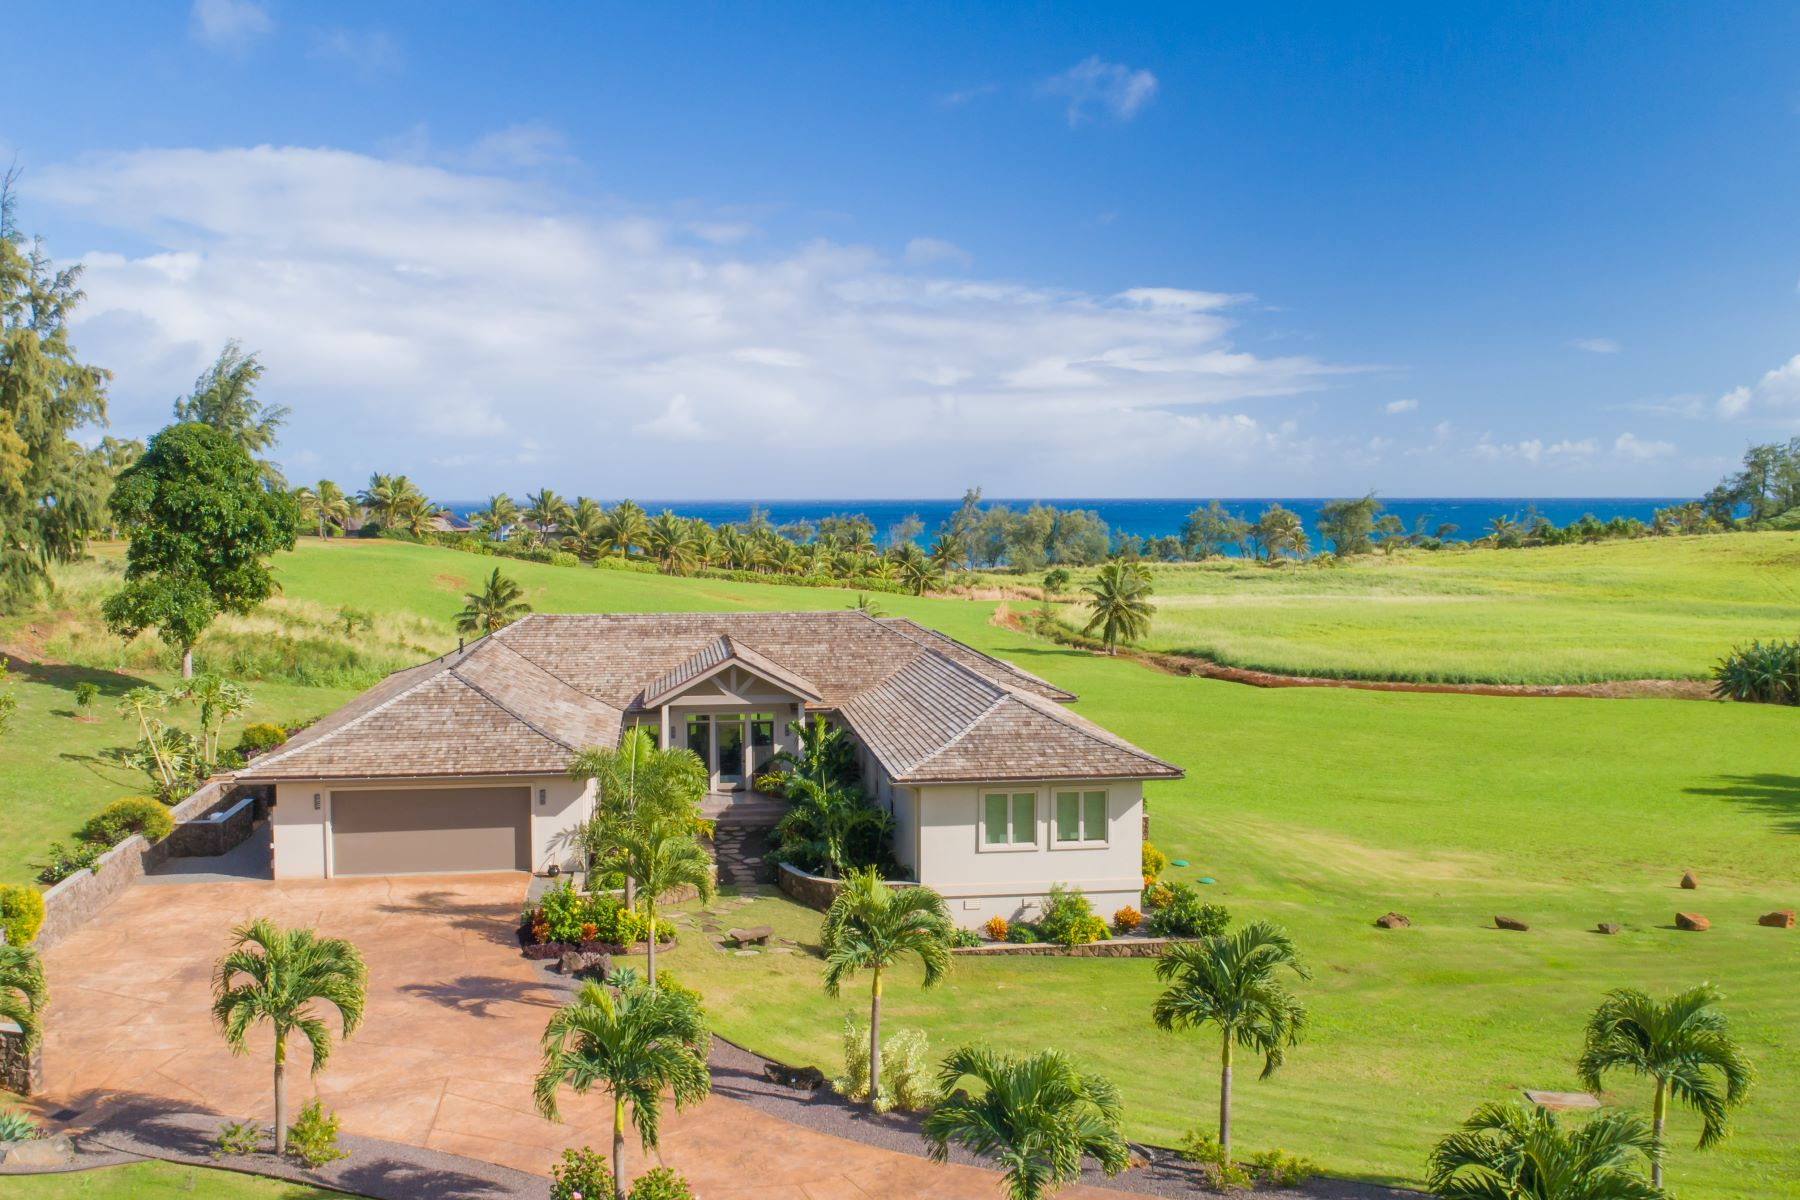 Single Family Home for Active at Kealia Kai 13 2732 Kapoli Street #13B Kealia, Hawaii 96746 United States